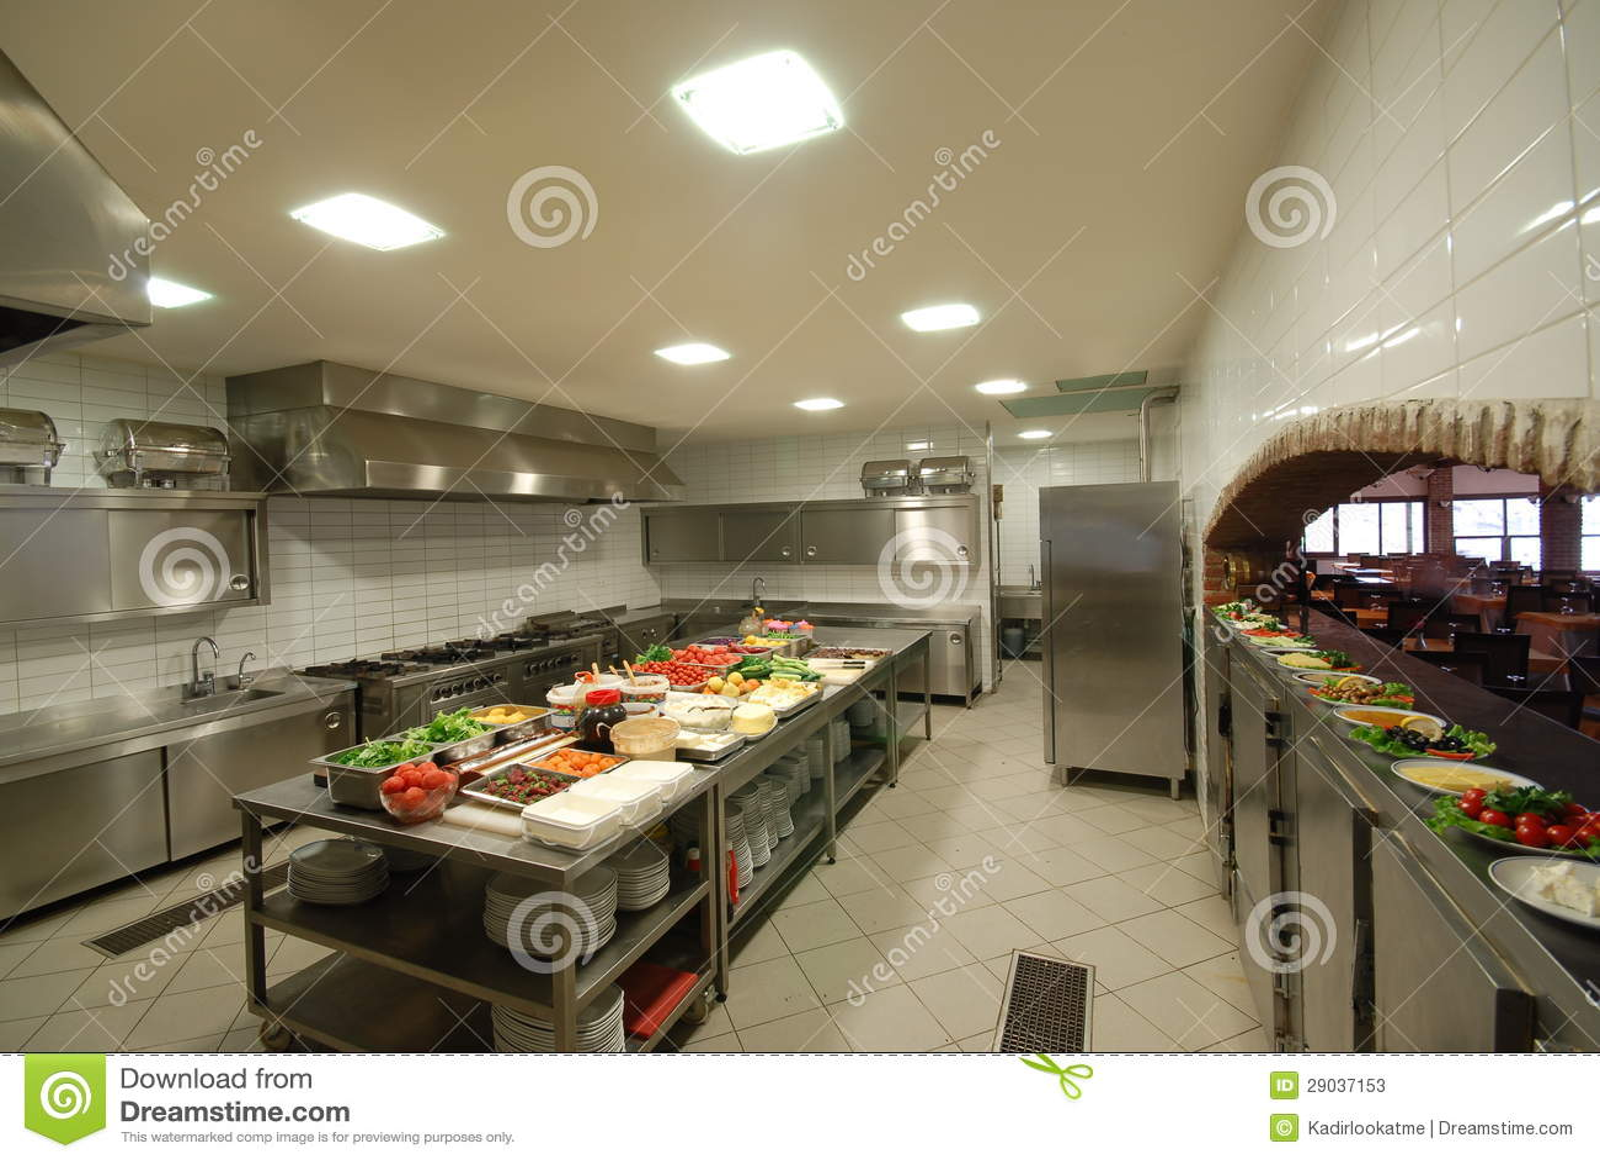 Cuisine moderne dans le restaurant photos stock image 29037153 for Moda le cuisine moderne